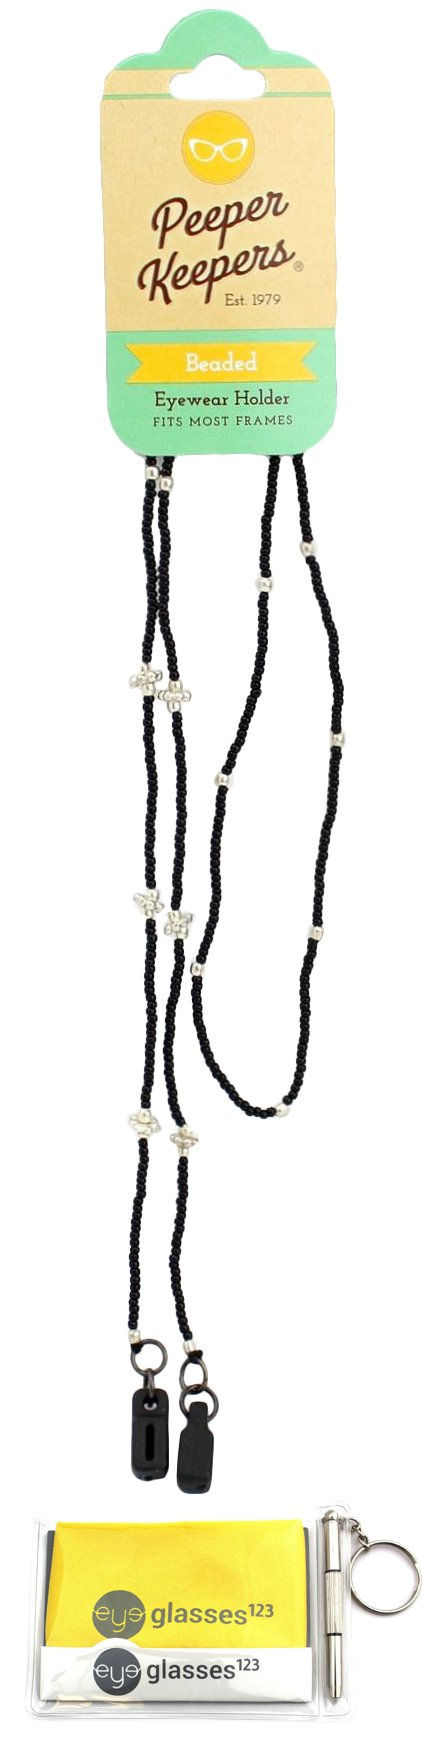 Eyeglass Retainer & Sunglass Holder By Peeper Keepers Classic Beads, Black Glass, 1pk | w/Microfiber Cloth & Screwdriver